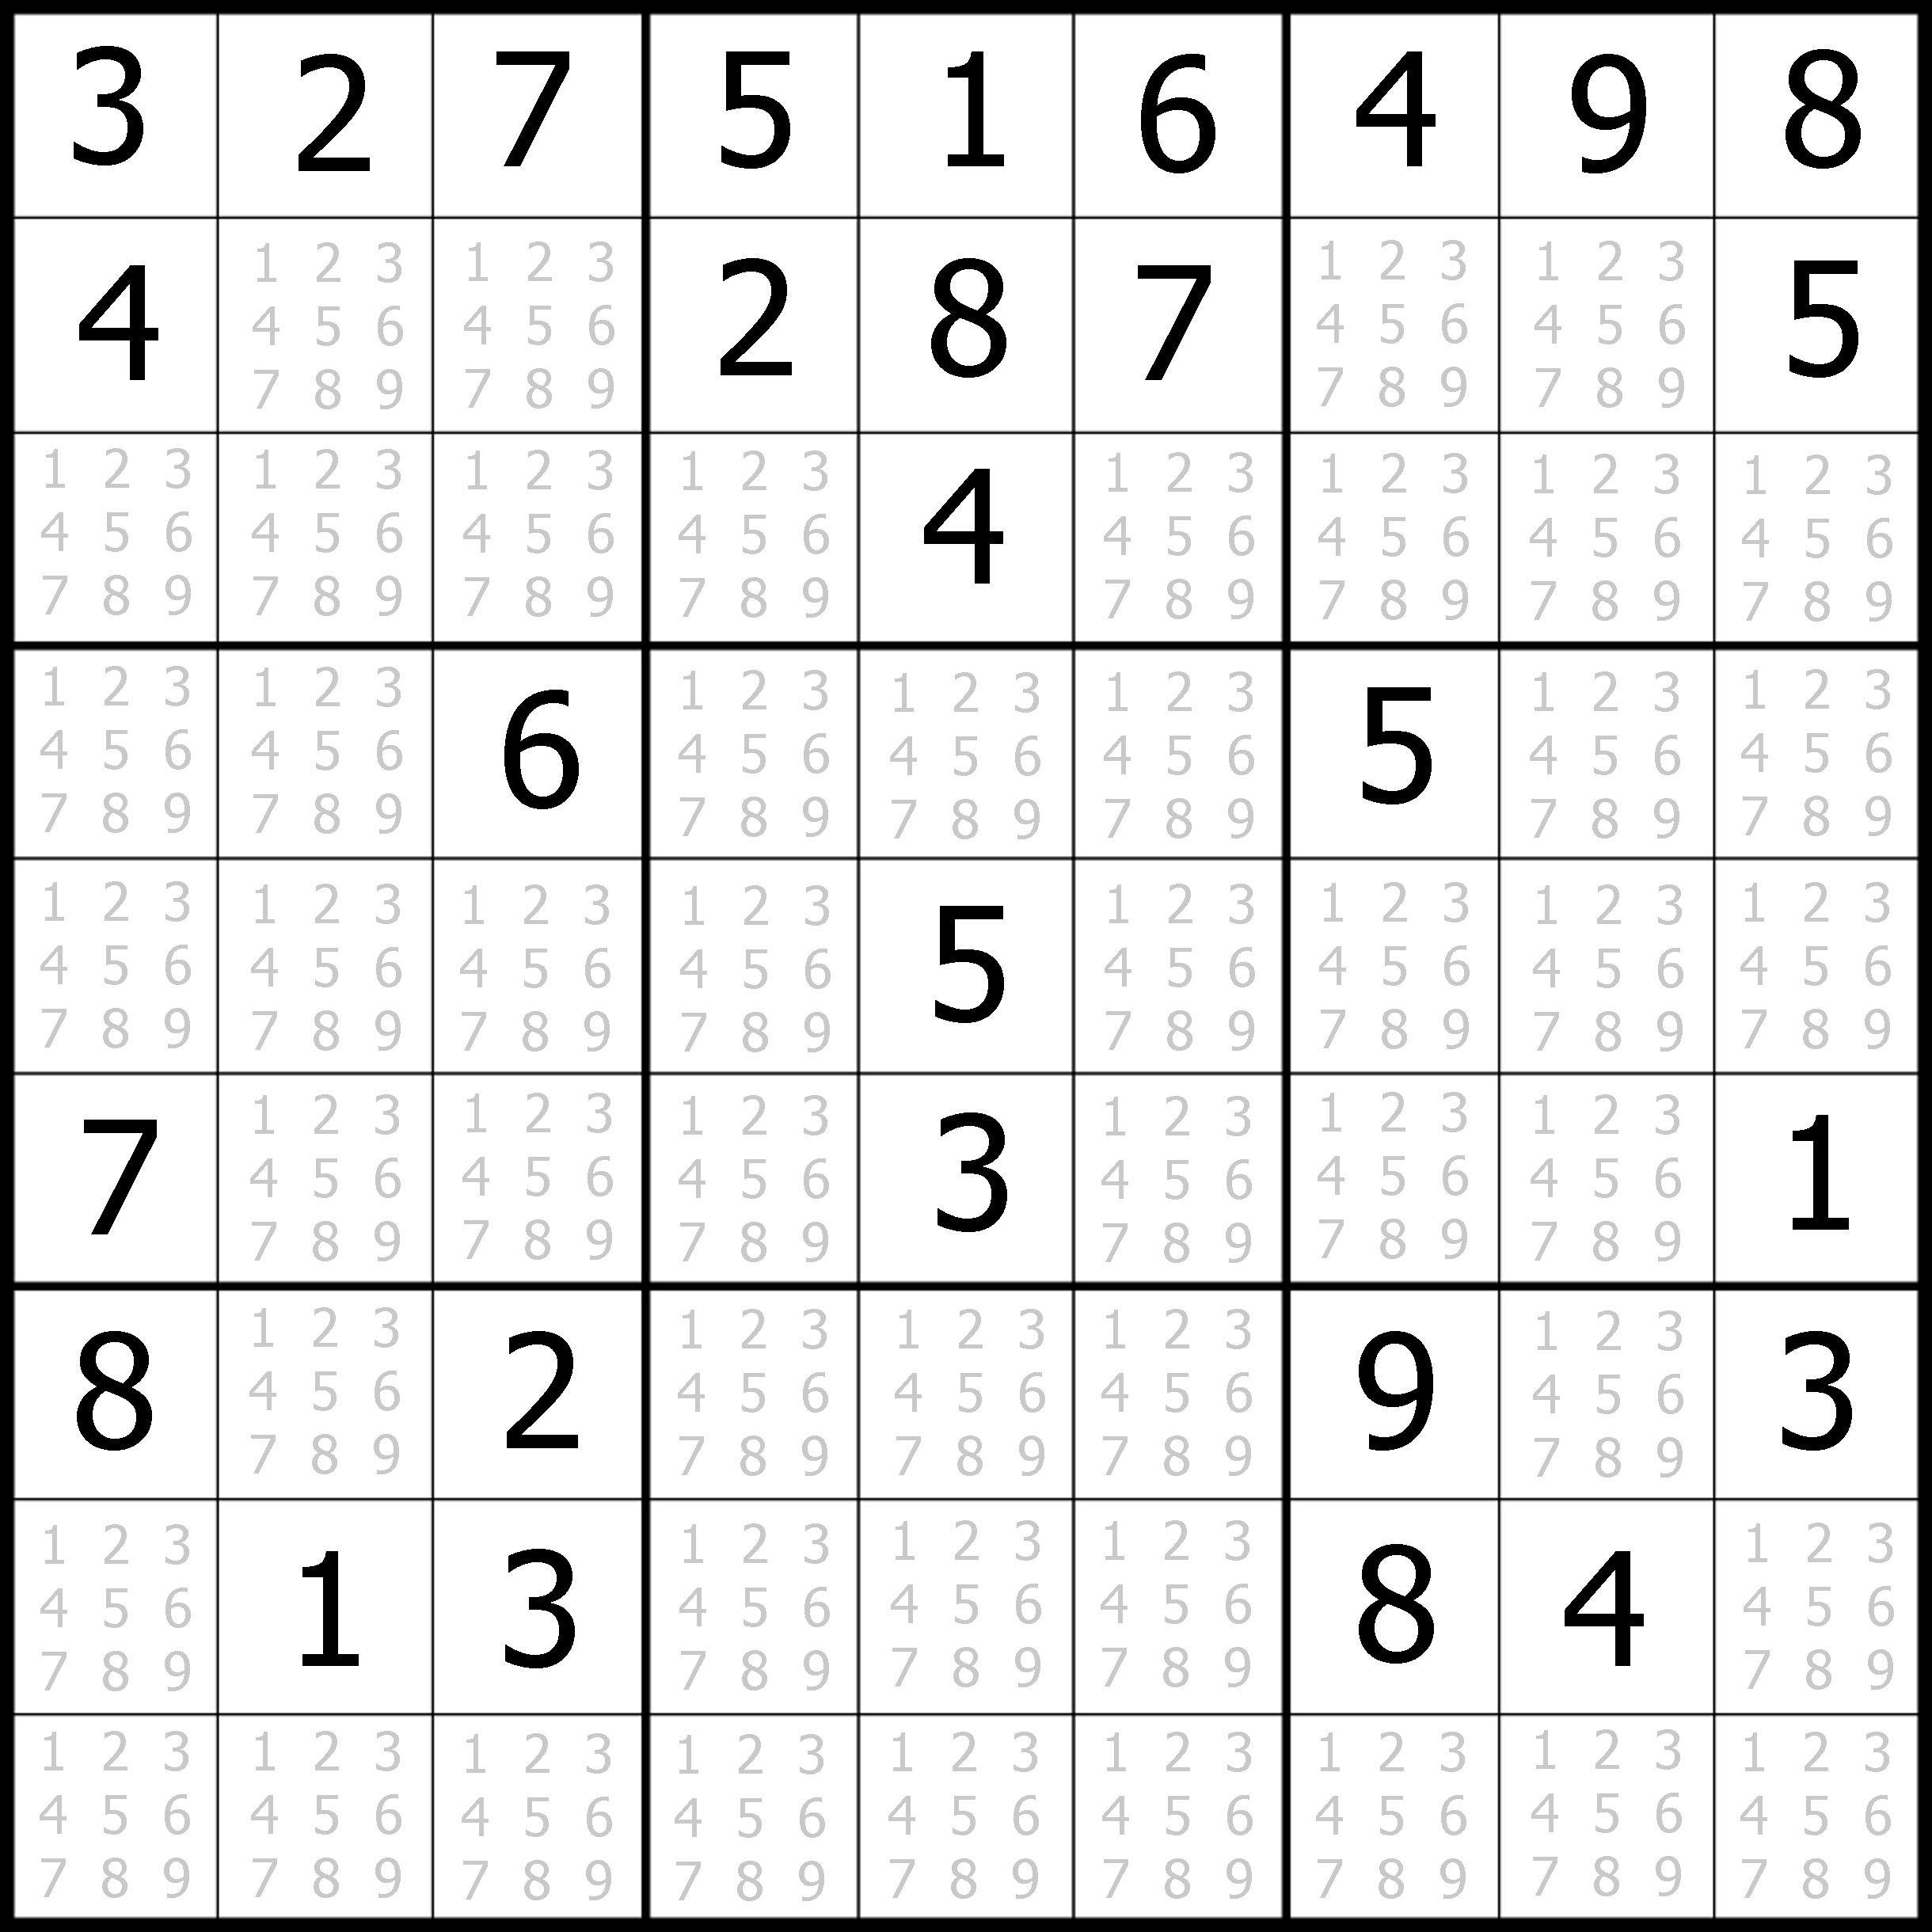 Free Printable Sudoku Puzzles Easy 1